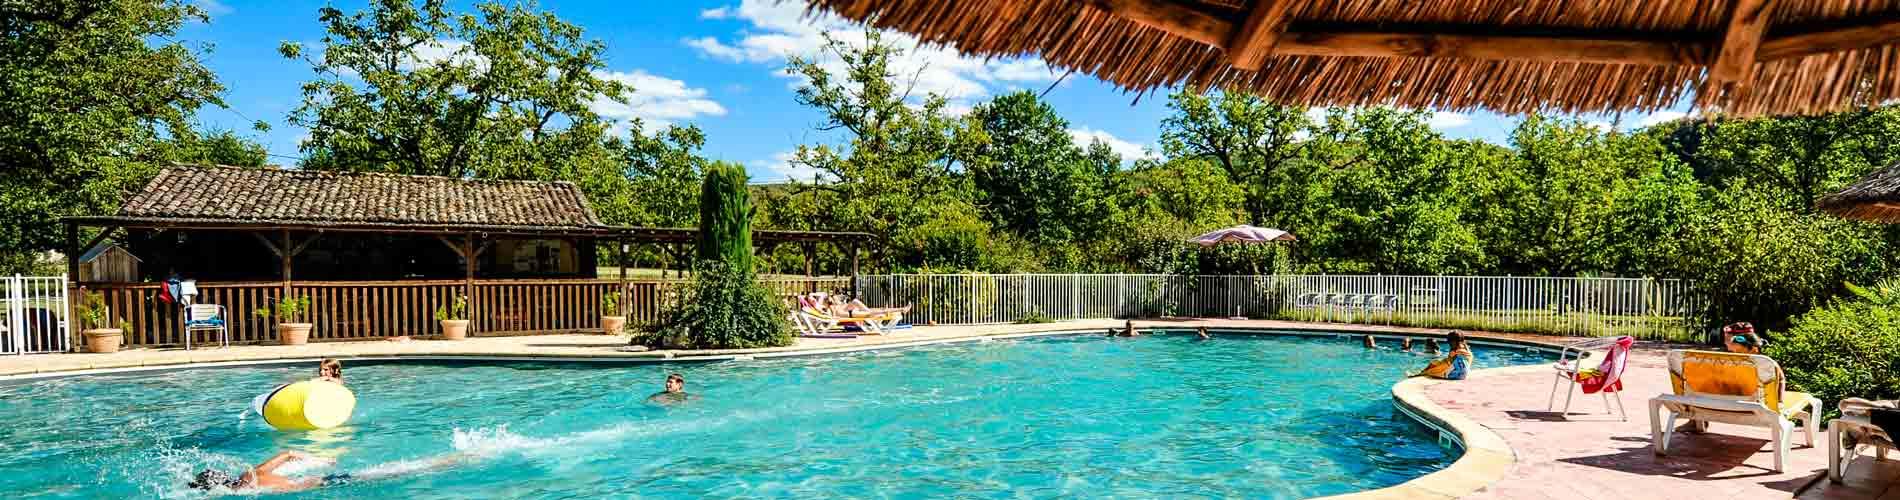 Camping lot avec piscine camping avec espace quatique for Camping dinard avec piscine